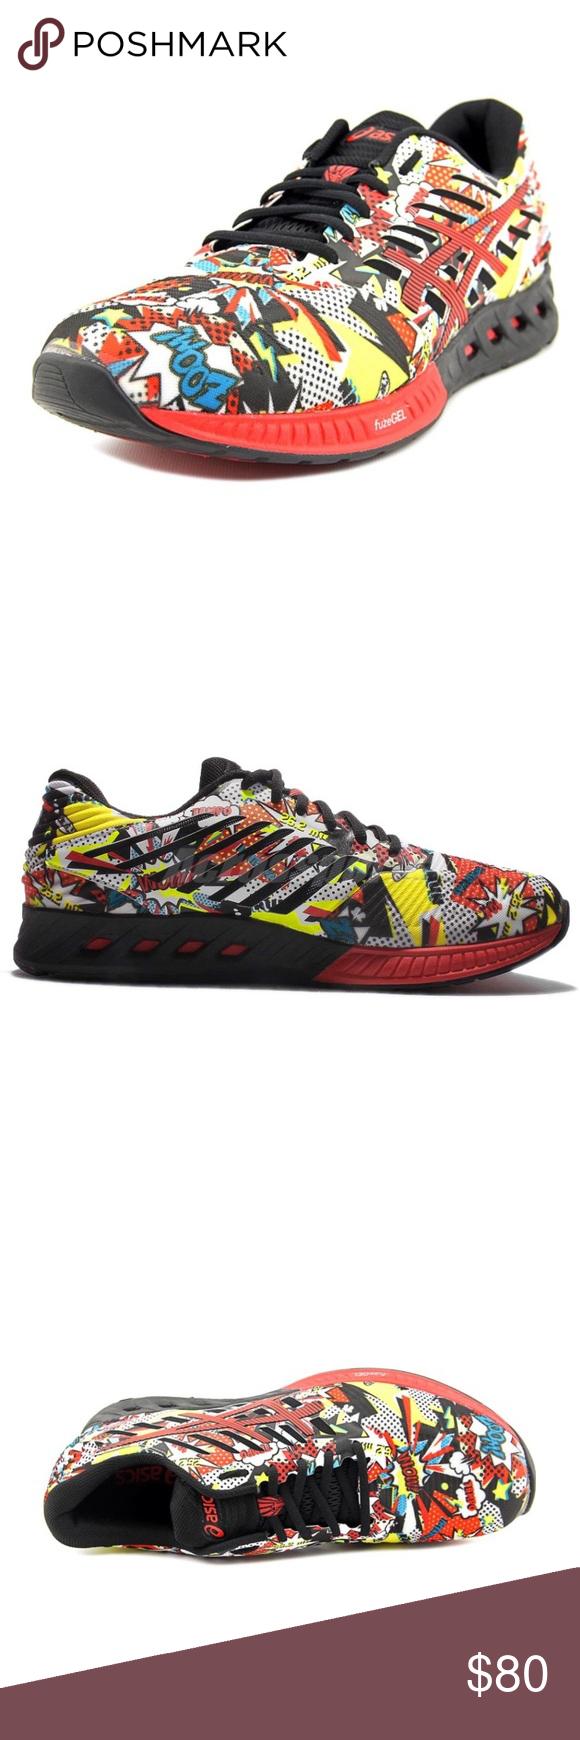 ASICS FuzeX Comic Edition Running Shoes Brand Asics Size